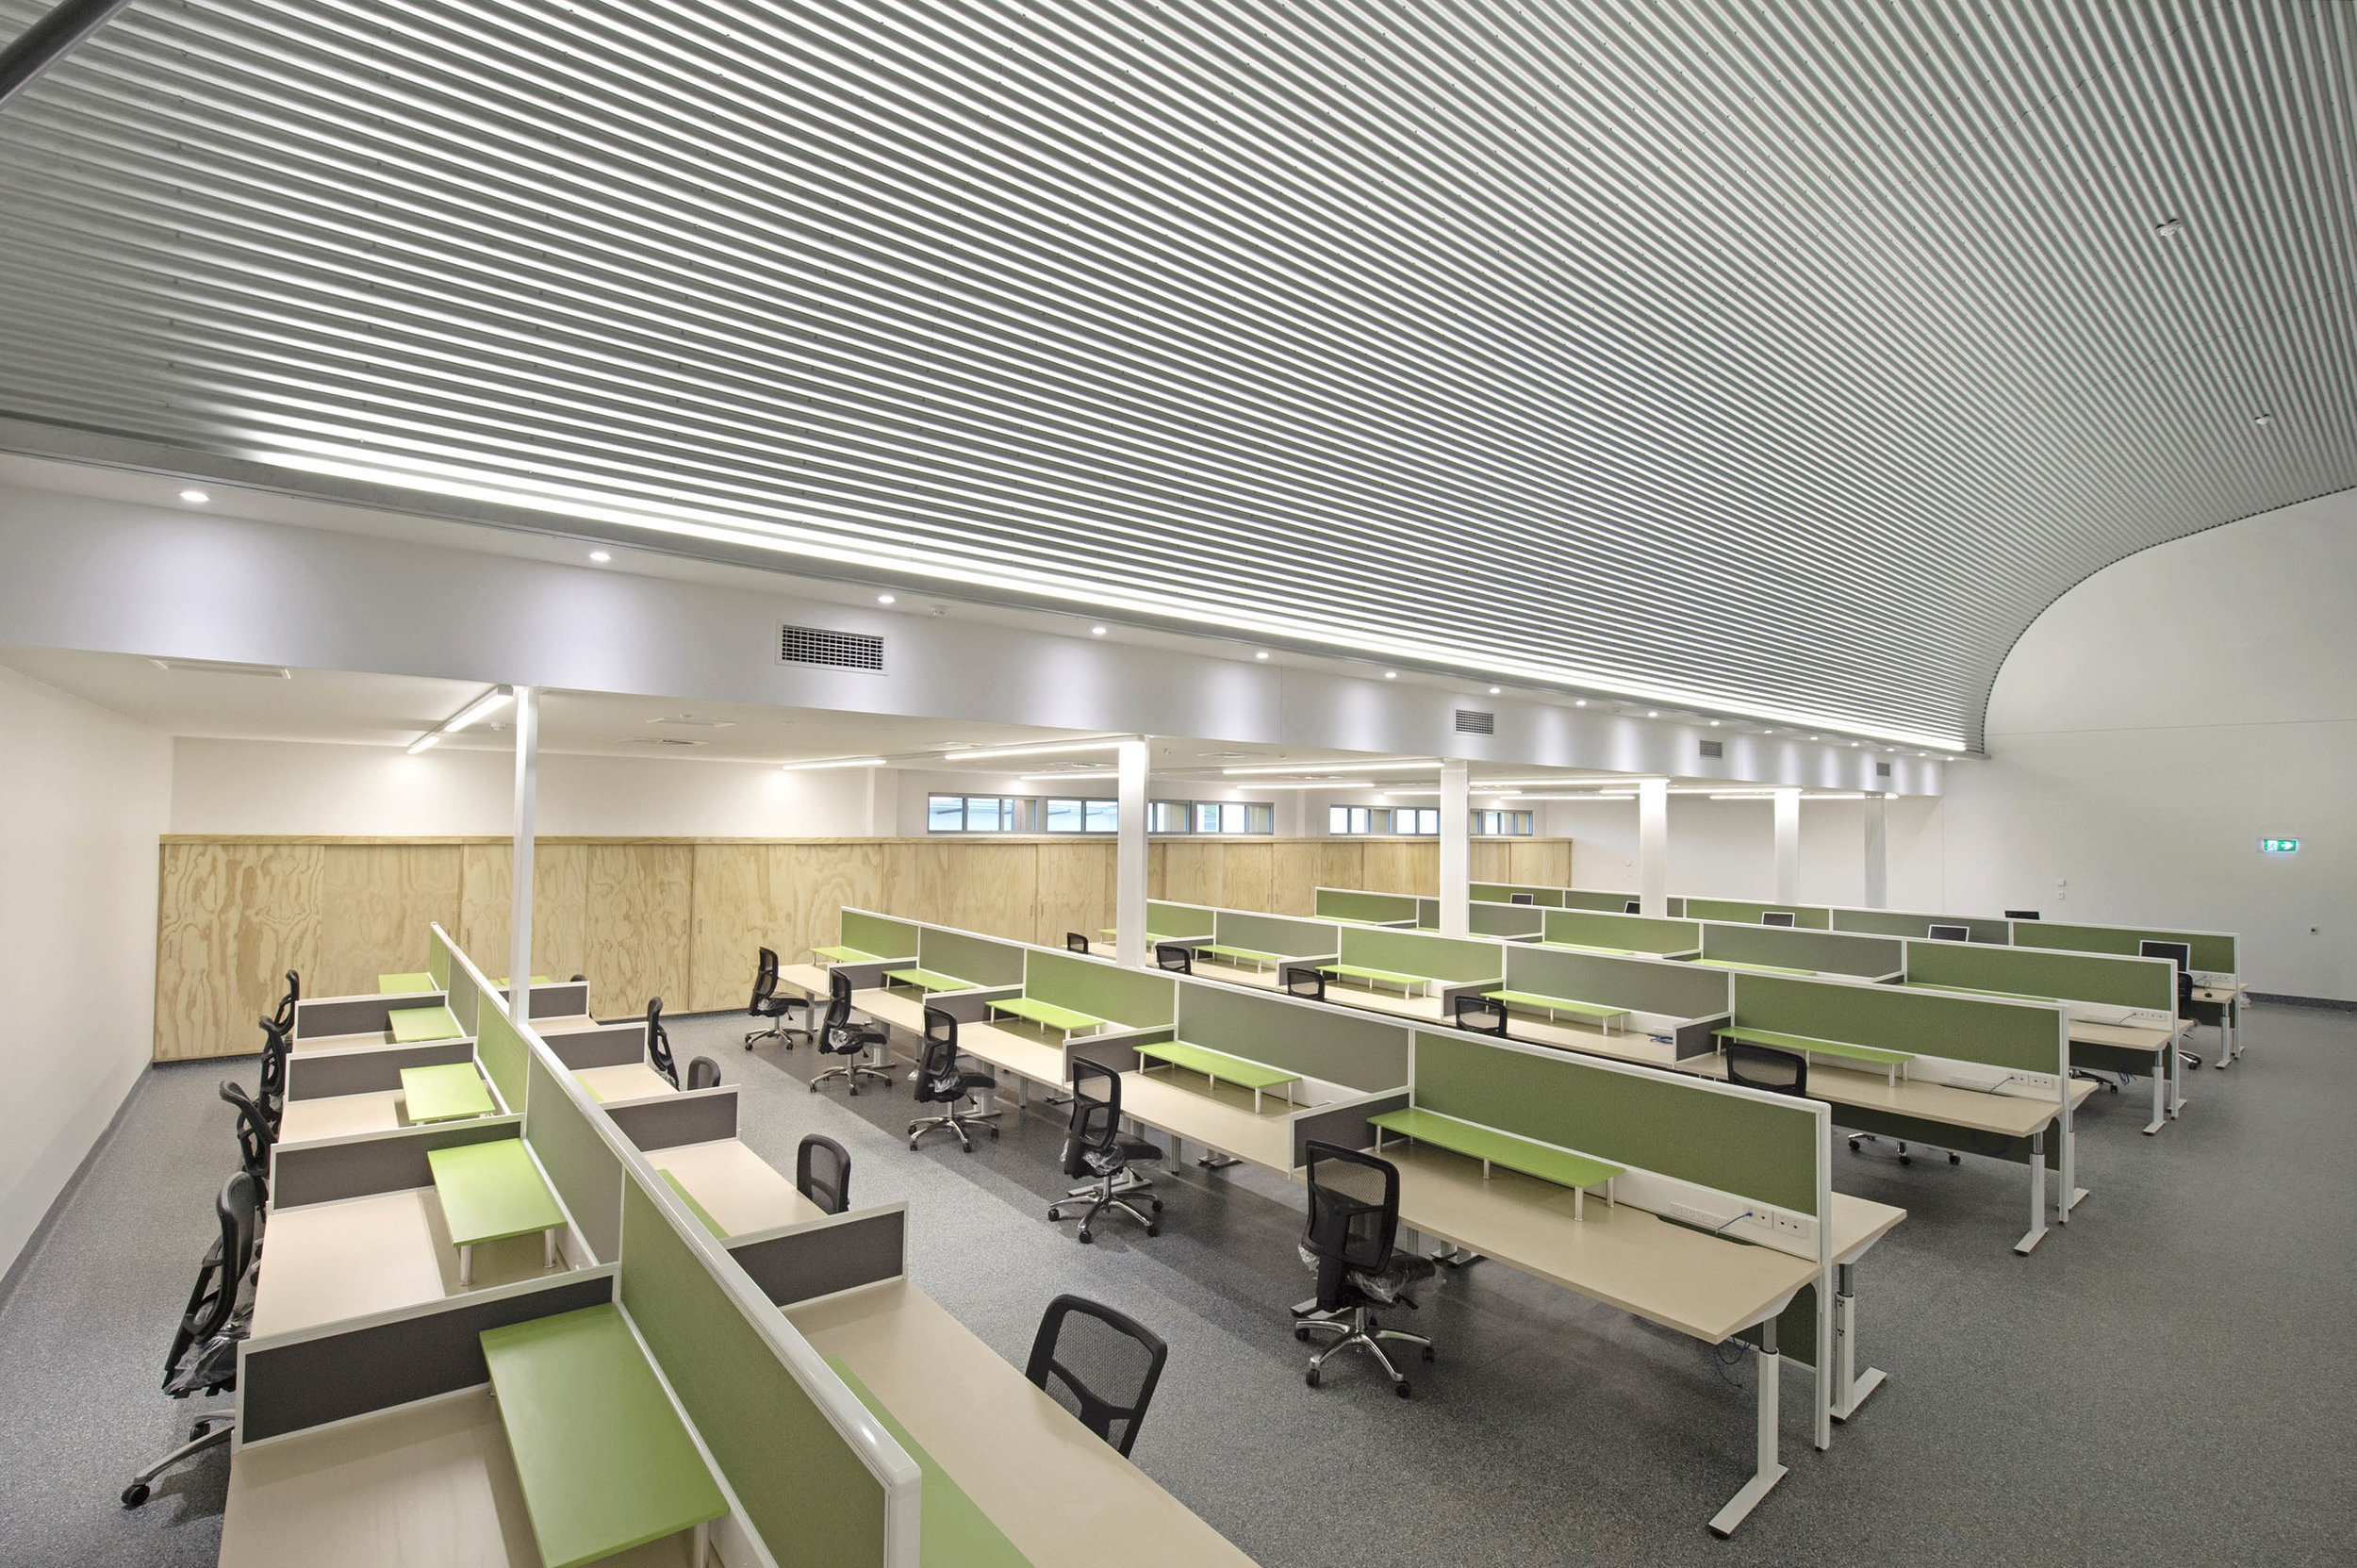 02_MODE_CDU Training Centre Interior_Shaana McNaught_website.jpg